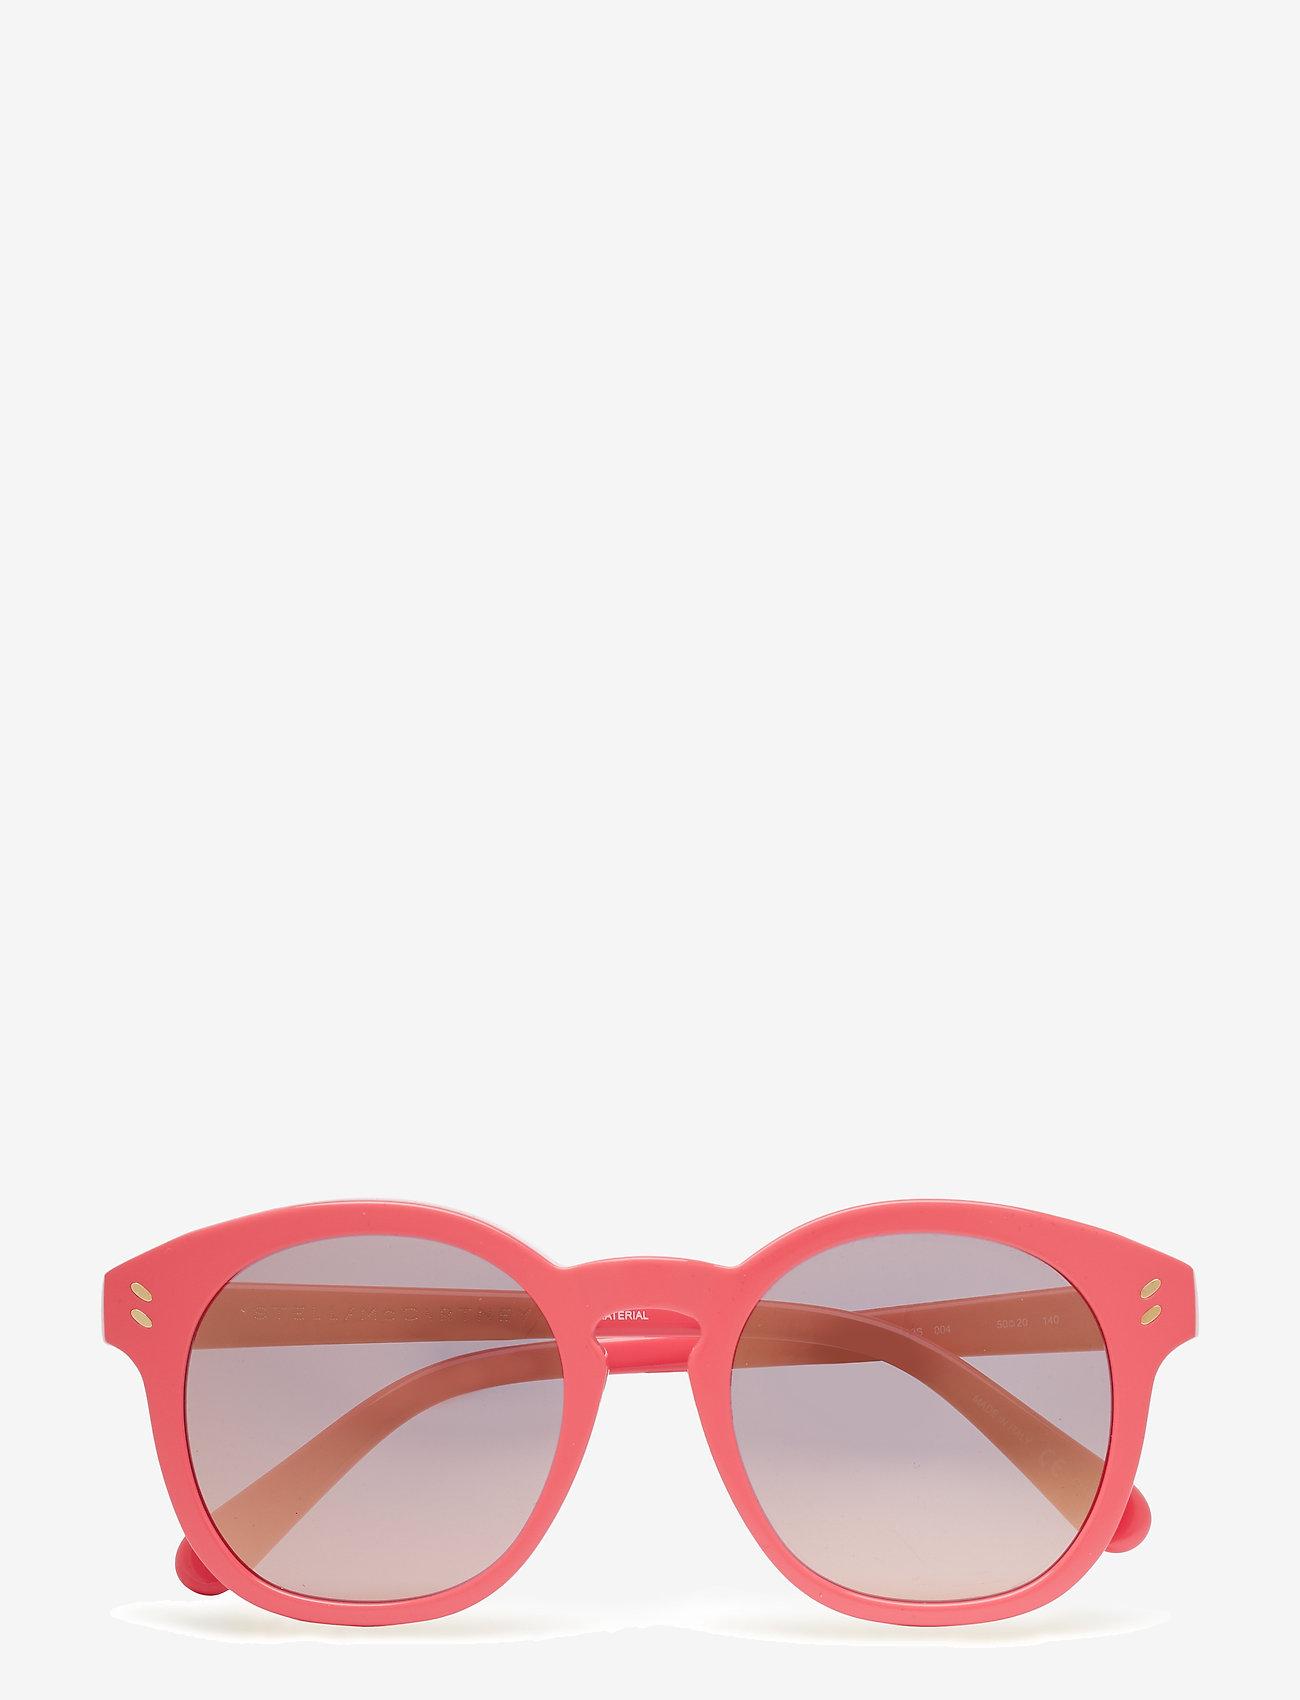 Stella McCartney Eyewear - SC0013S - ar apaļu rāmi - pink-pink-pink - 0